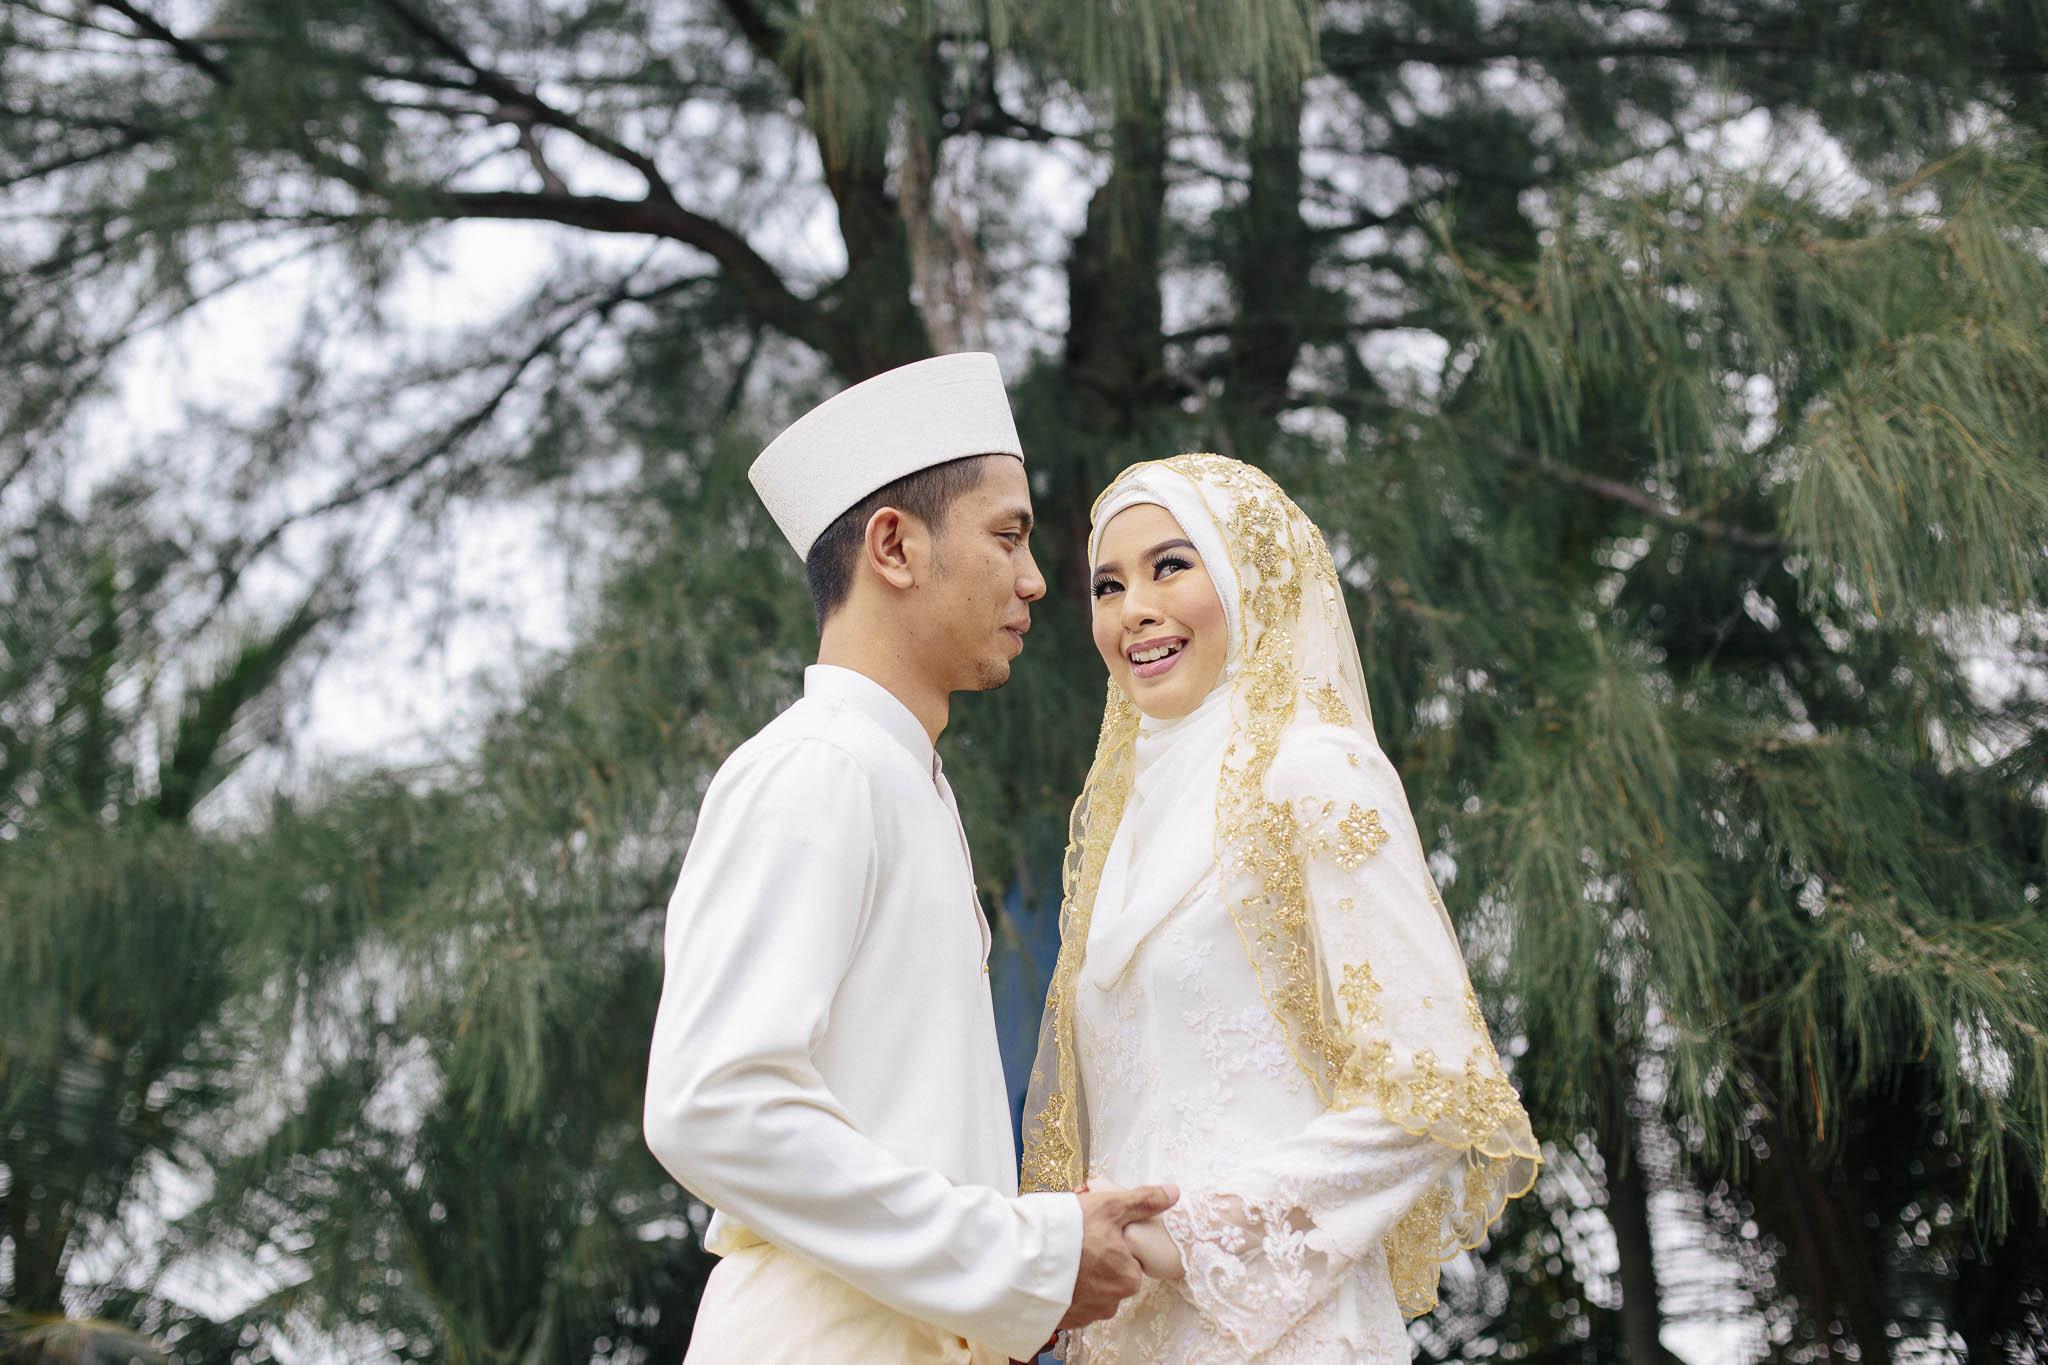 singapore-wedding-photographer-malay-indian-pre-wedding-travel-wmt-2015-60.jpg